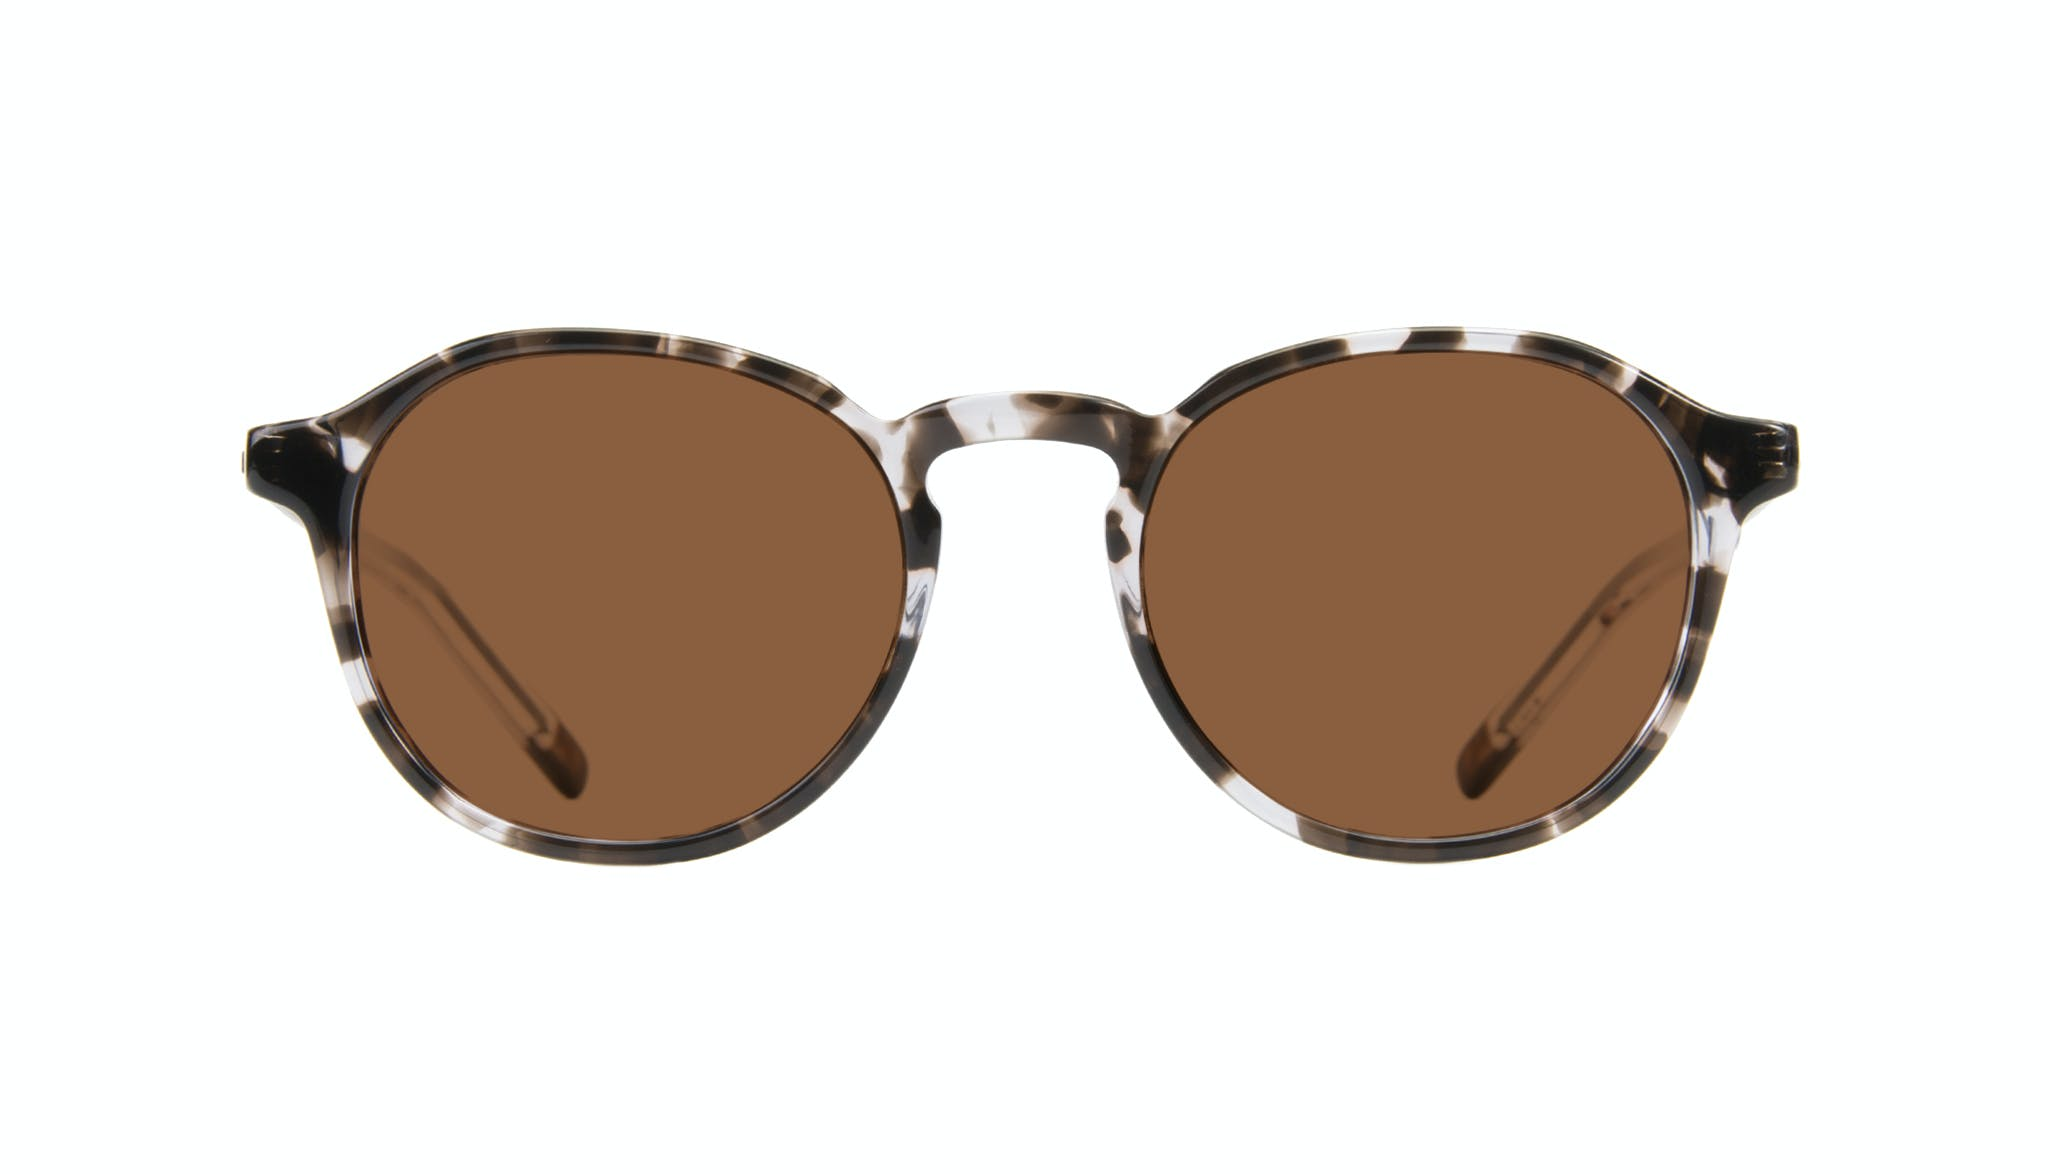 Affordable Fashion Glasses Round Sunglasses Men Prime Mud Tort